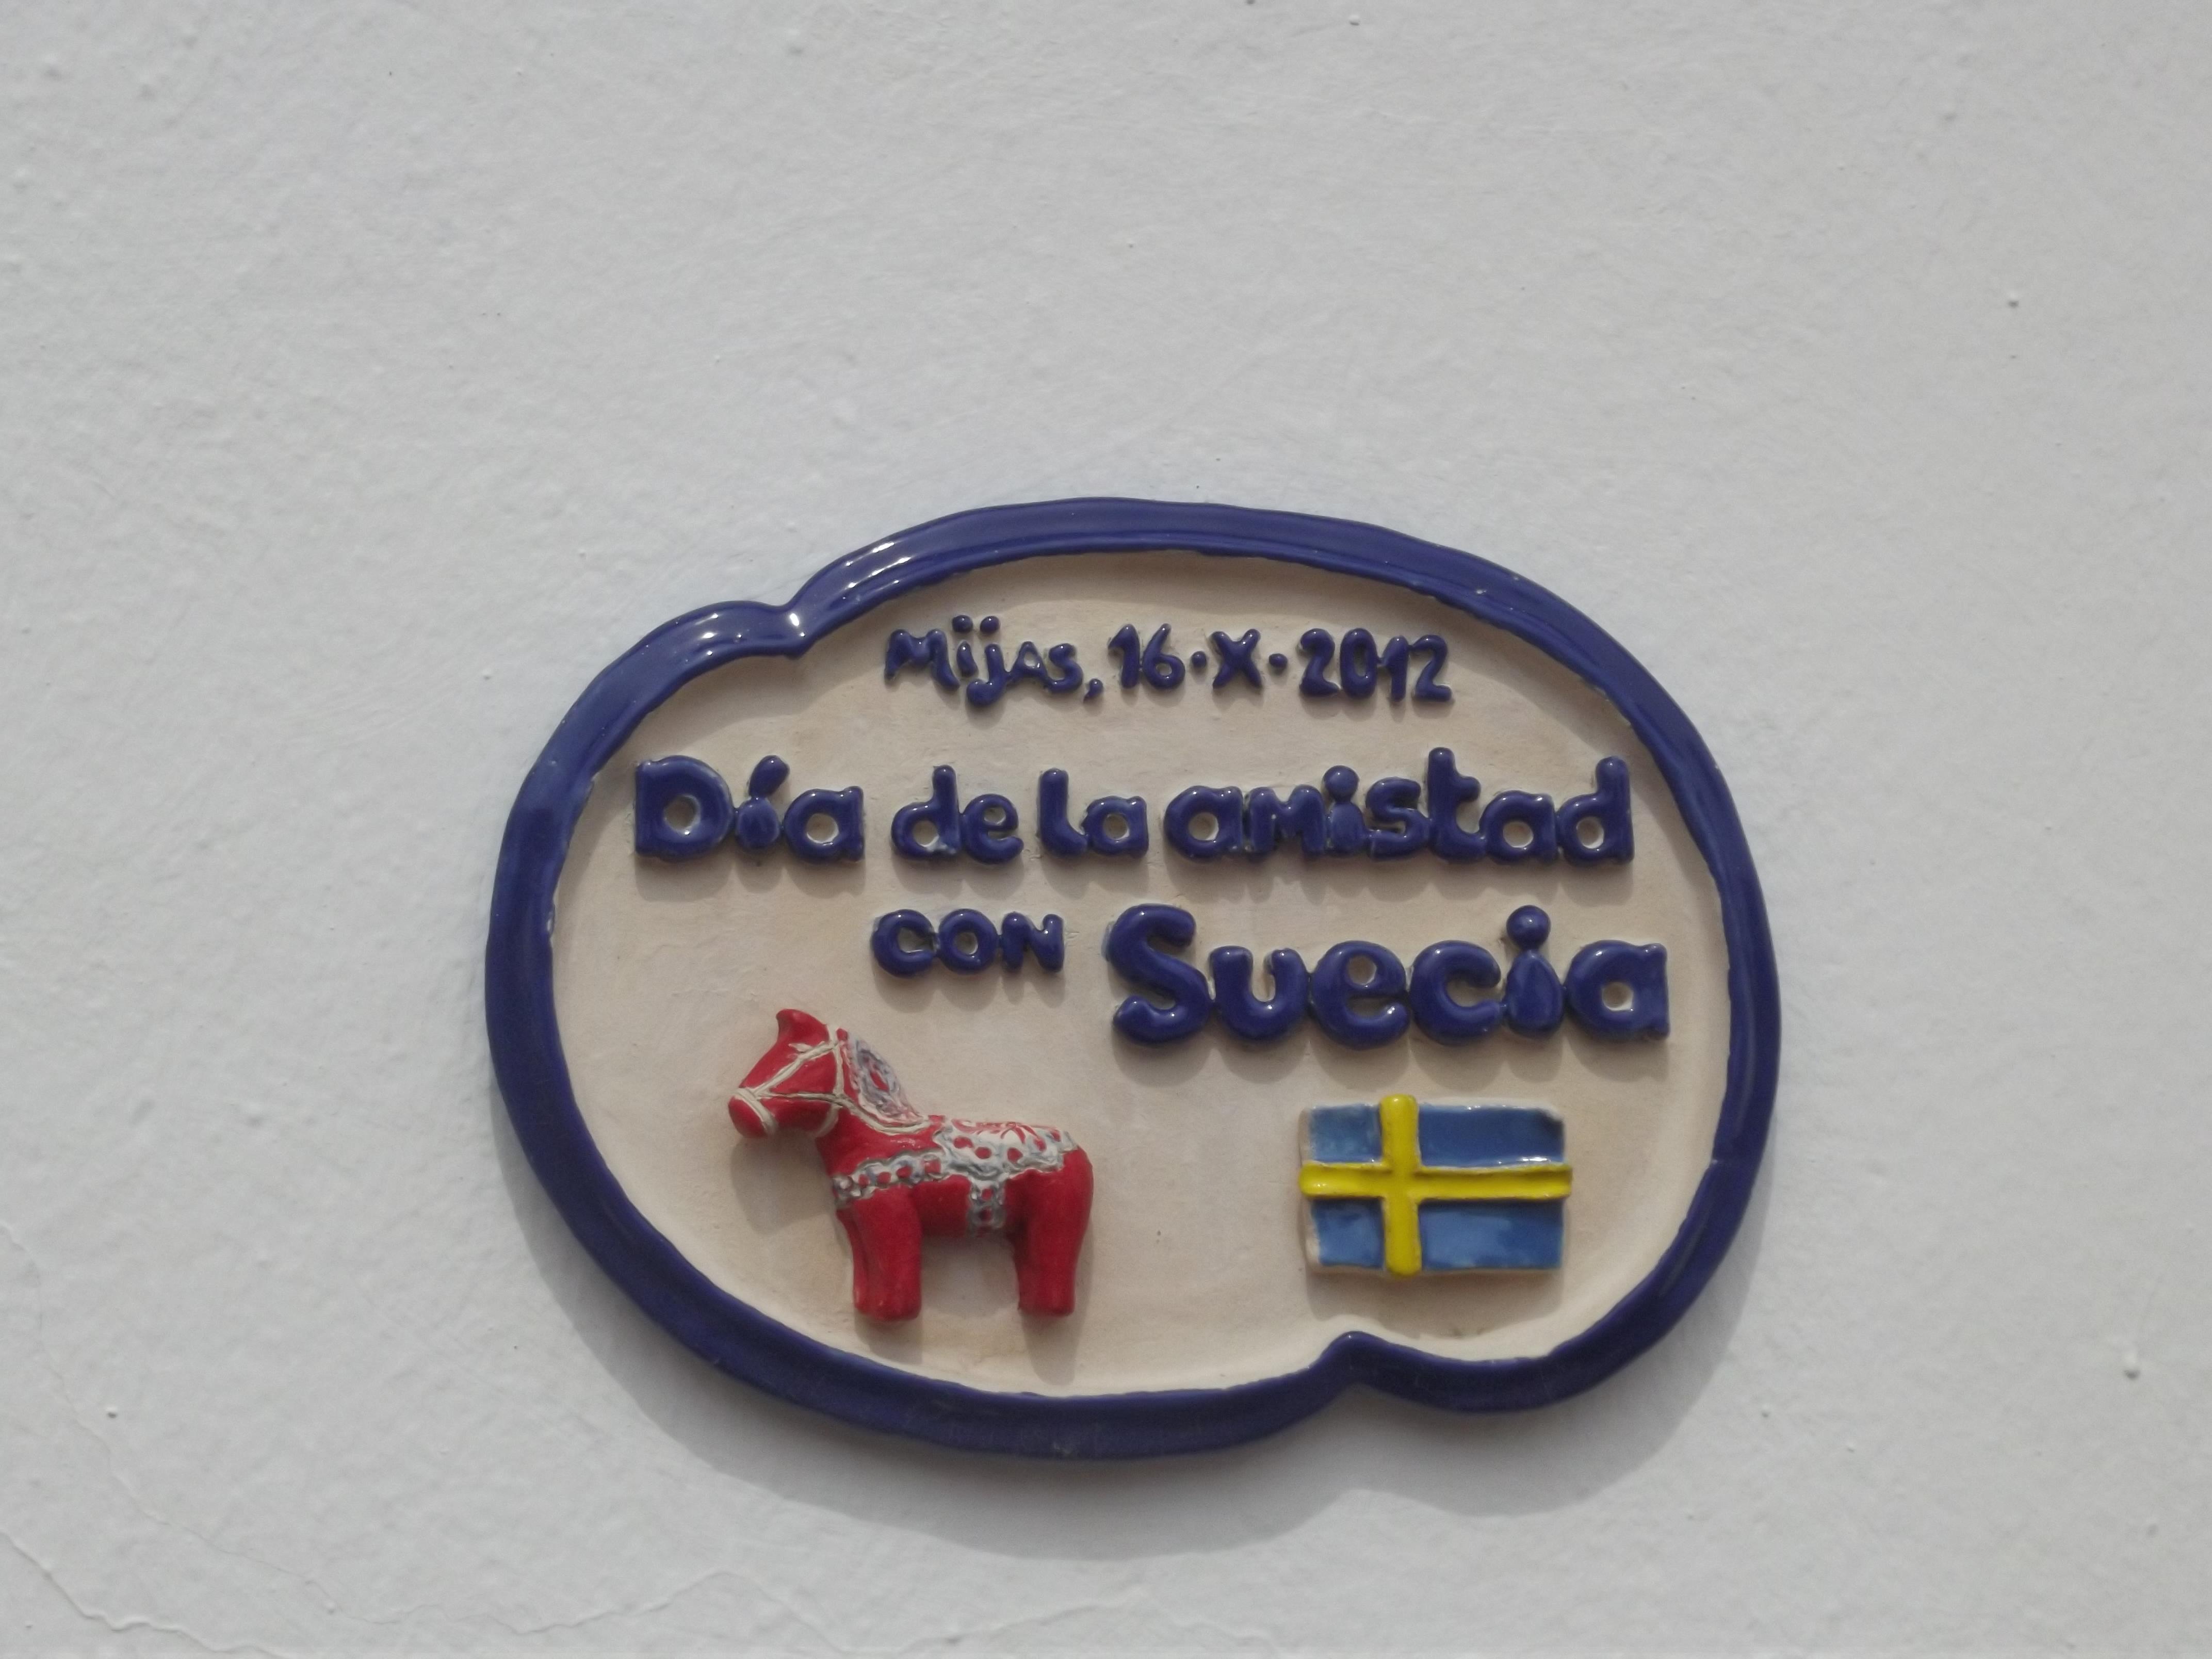 FileTourism Office Mijas World Map Sweden Jpg - Map sweden 2014